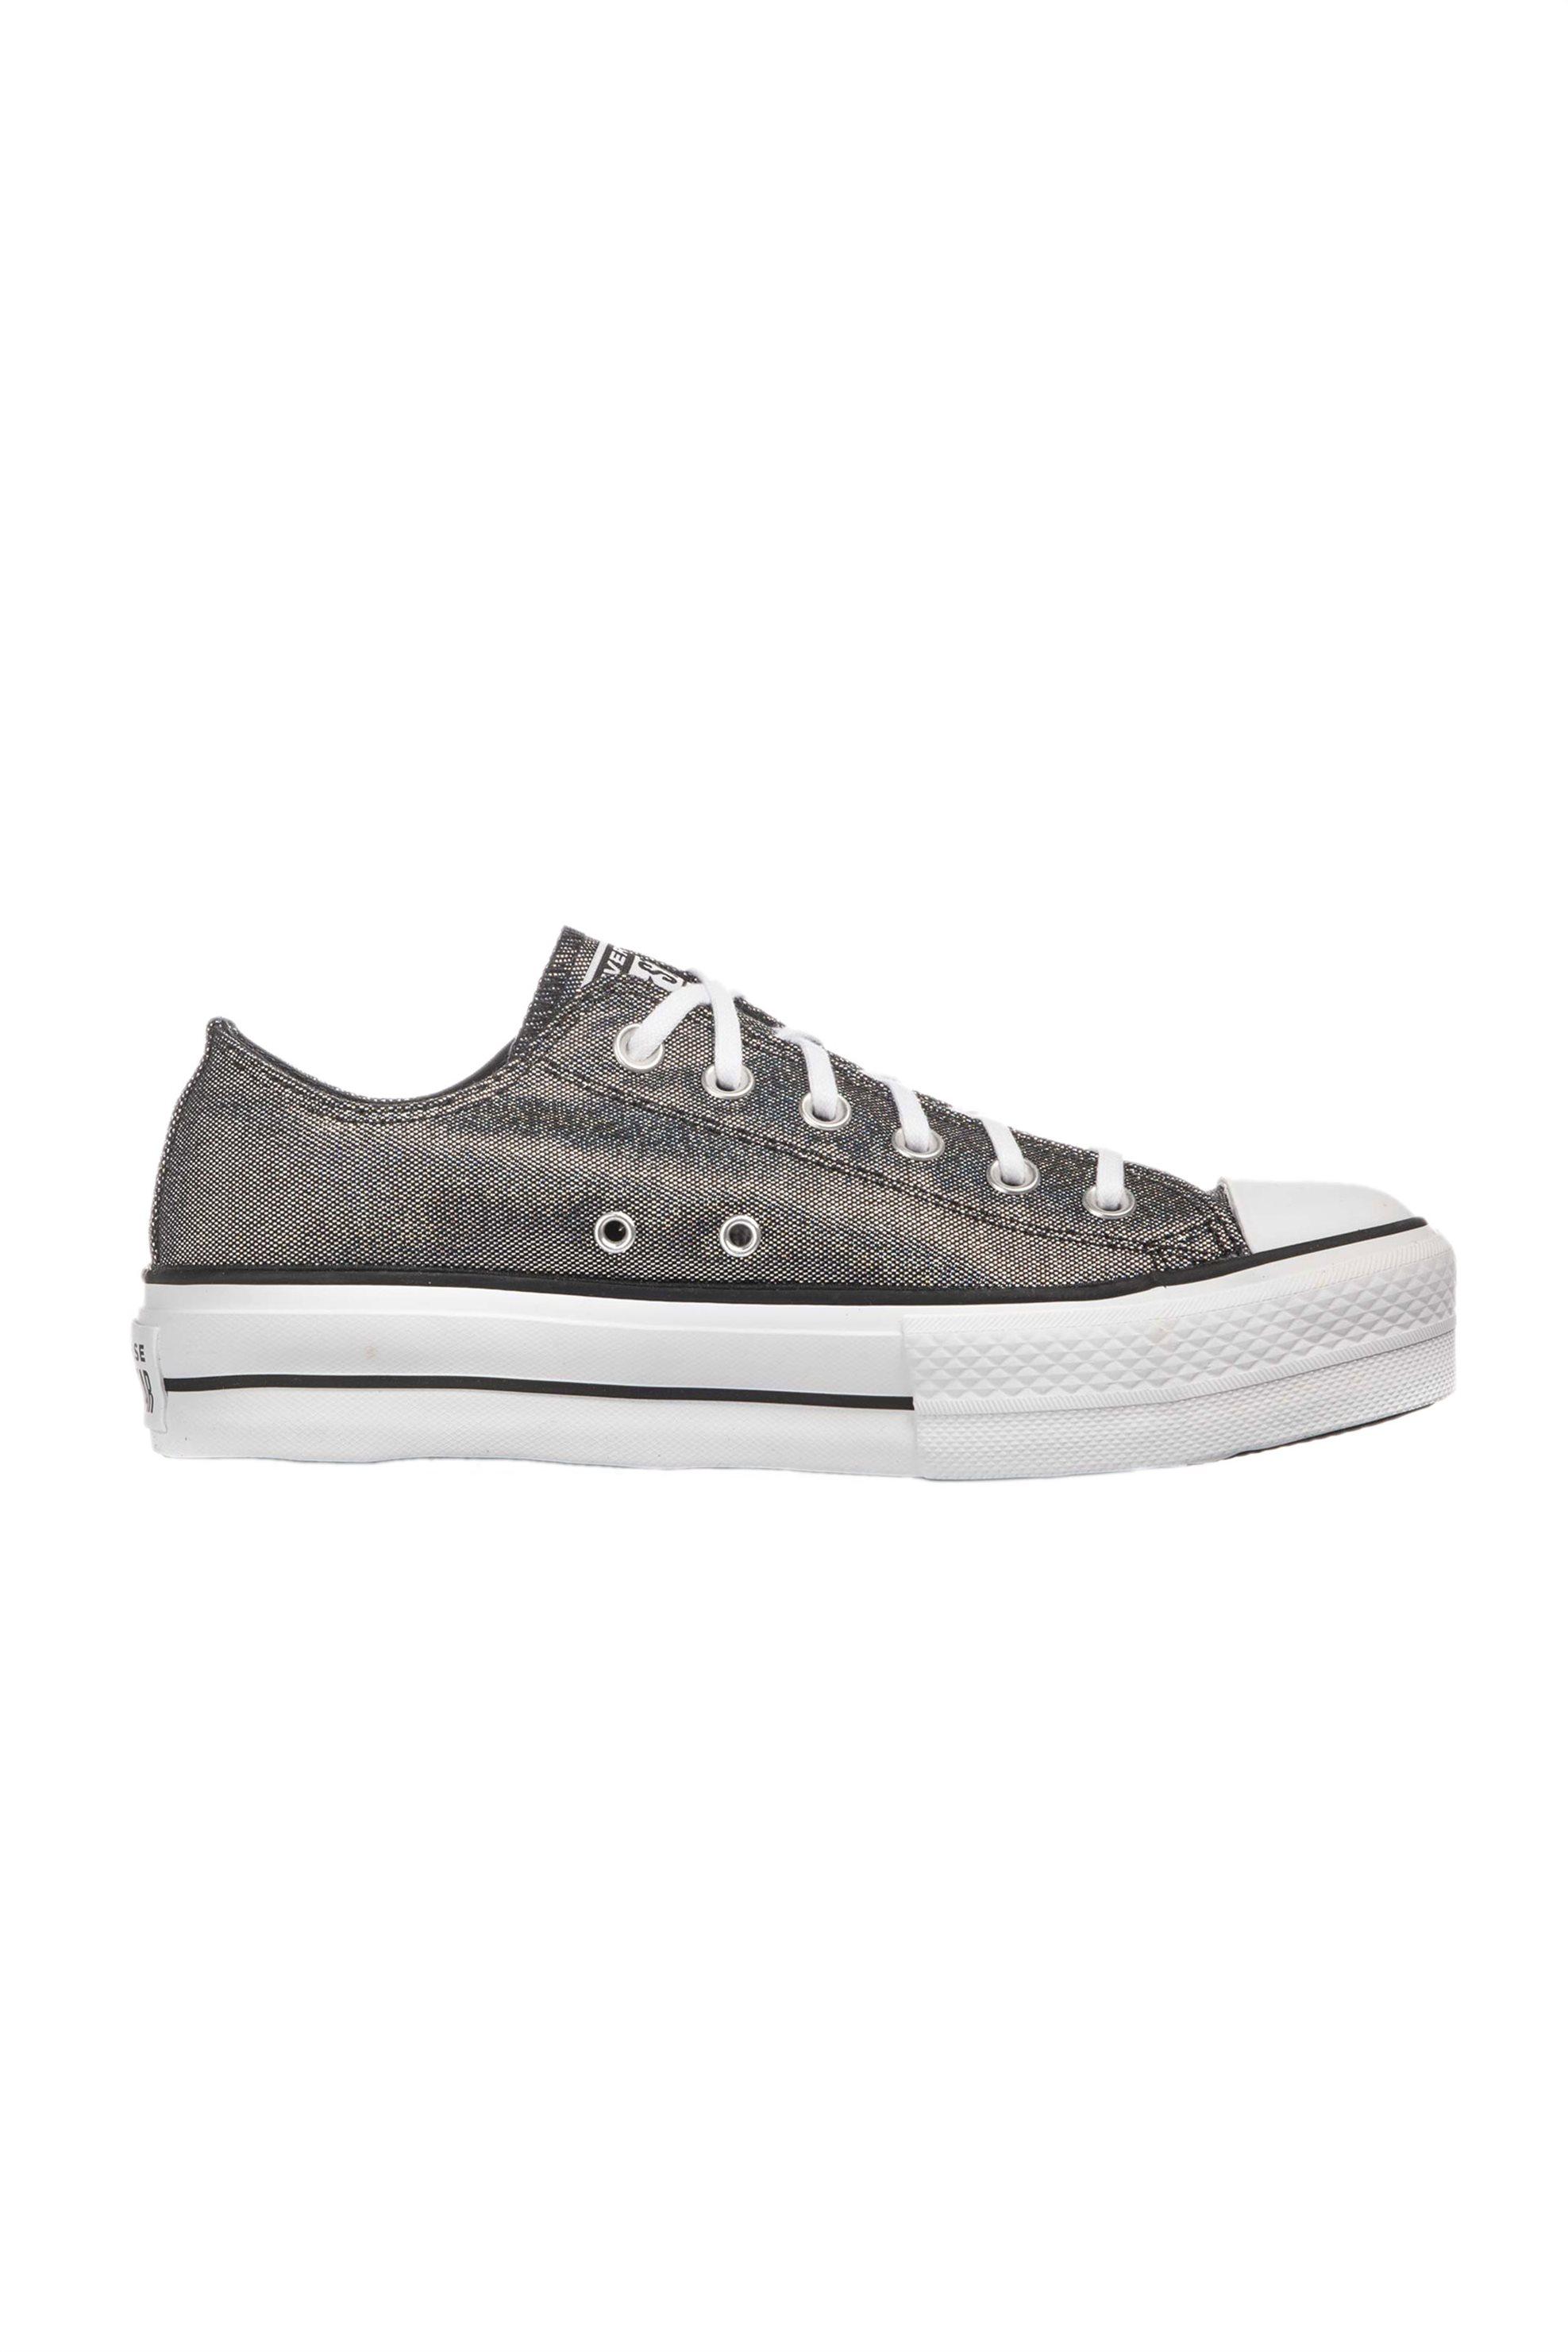 Converse γυναικεία chunky sneakers μεταλλιζέ